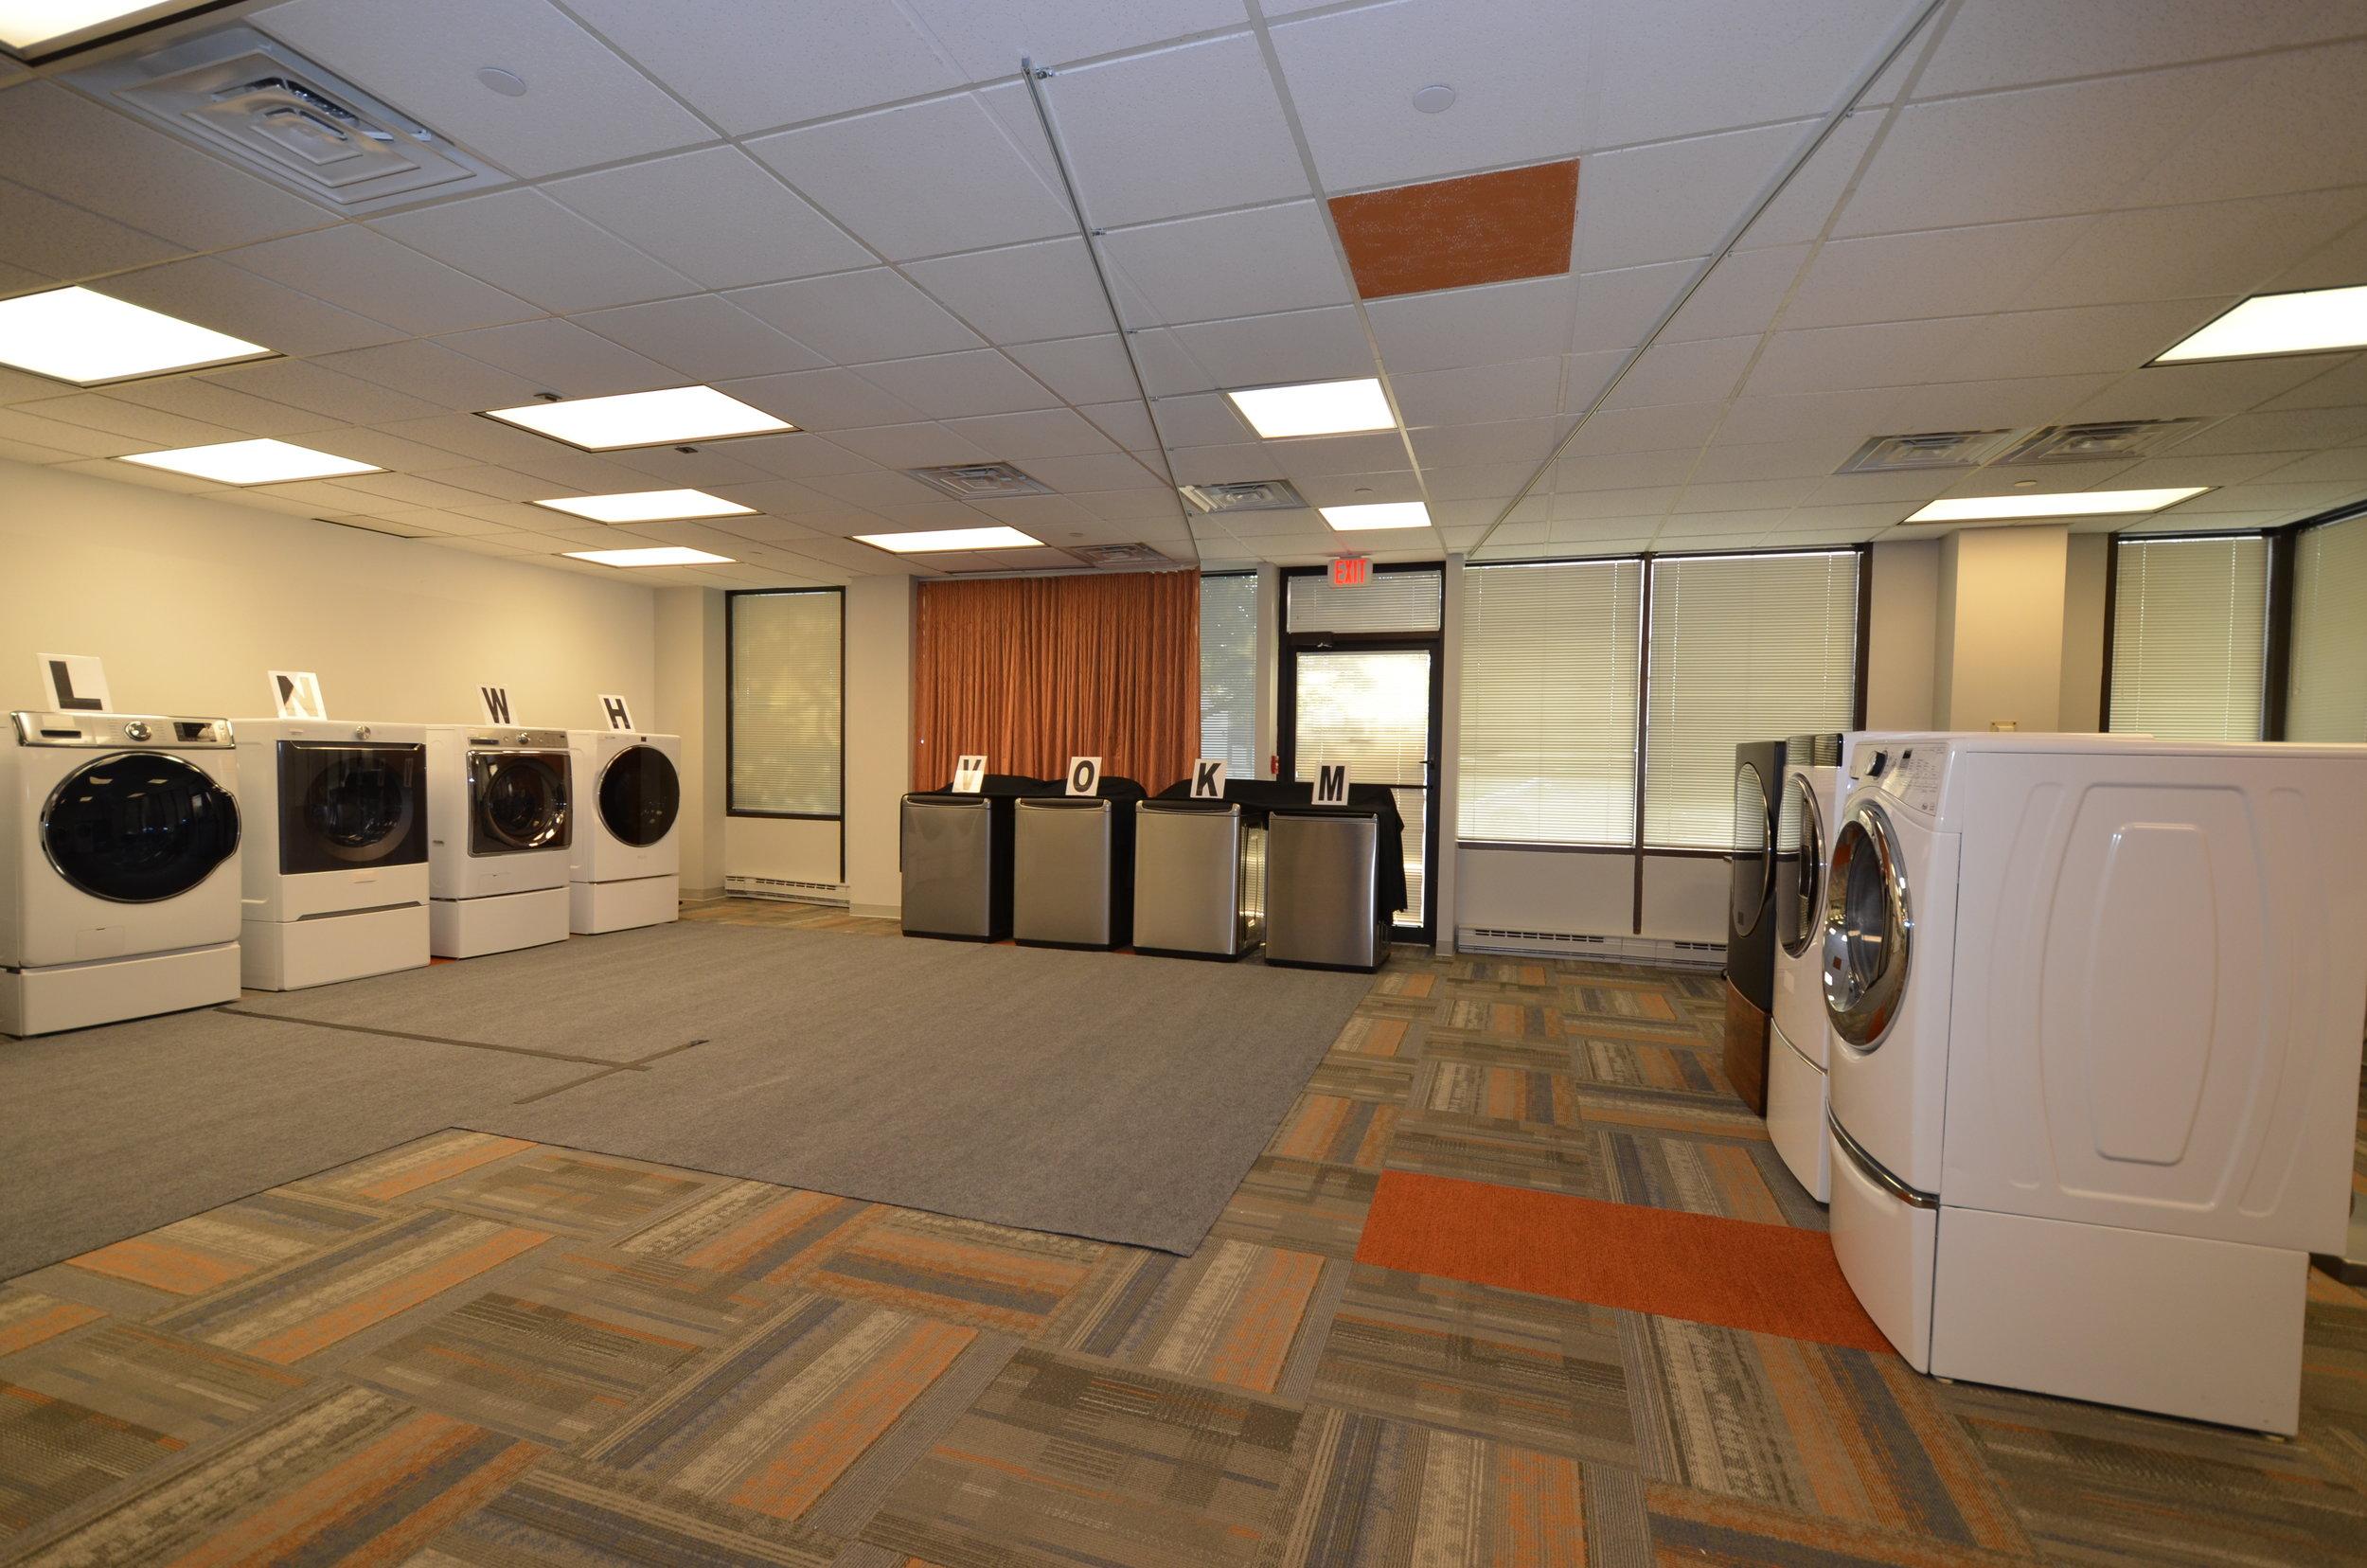 Applaince washers.JPG